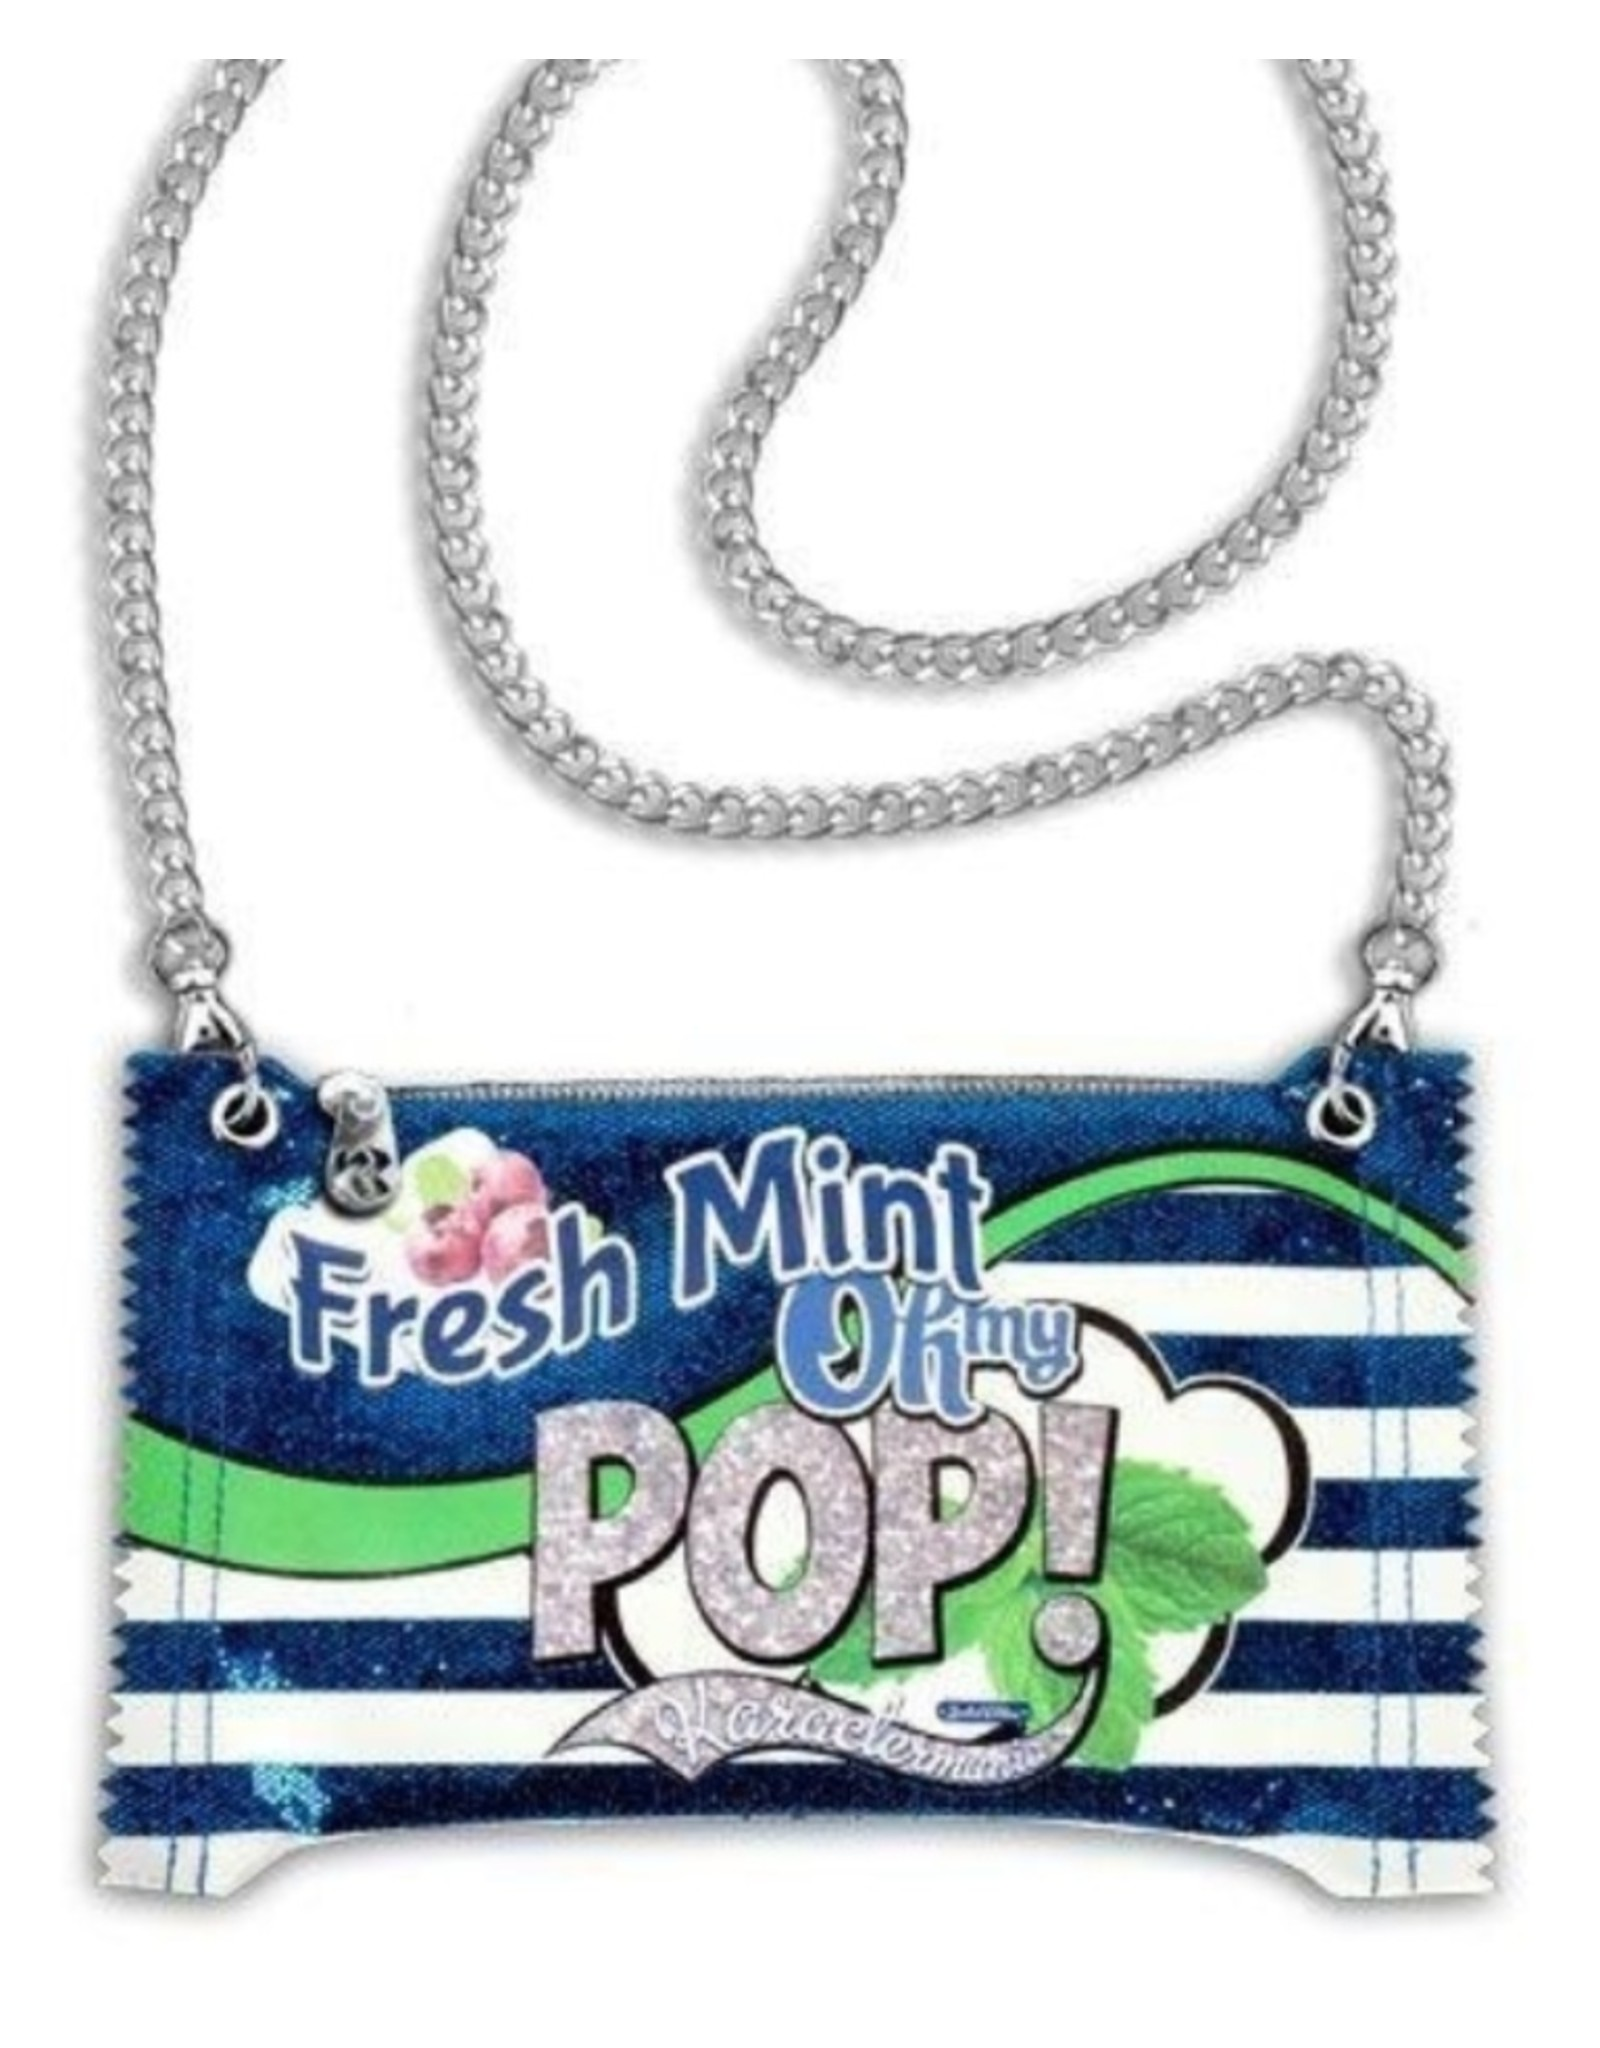 Oh my Pop! Fantasy bags and wallets - Oh My Pop! Fresh Mint Bubblegum shoulder bag